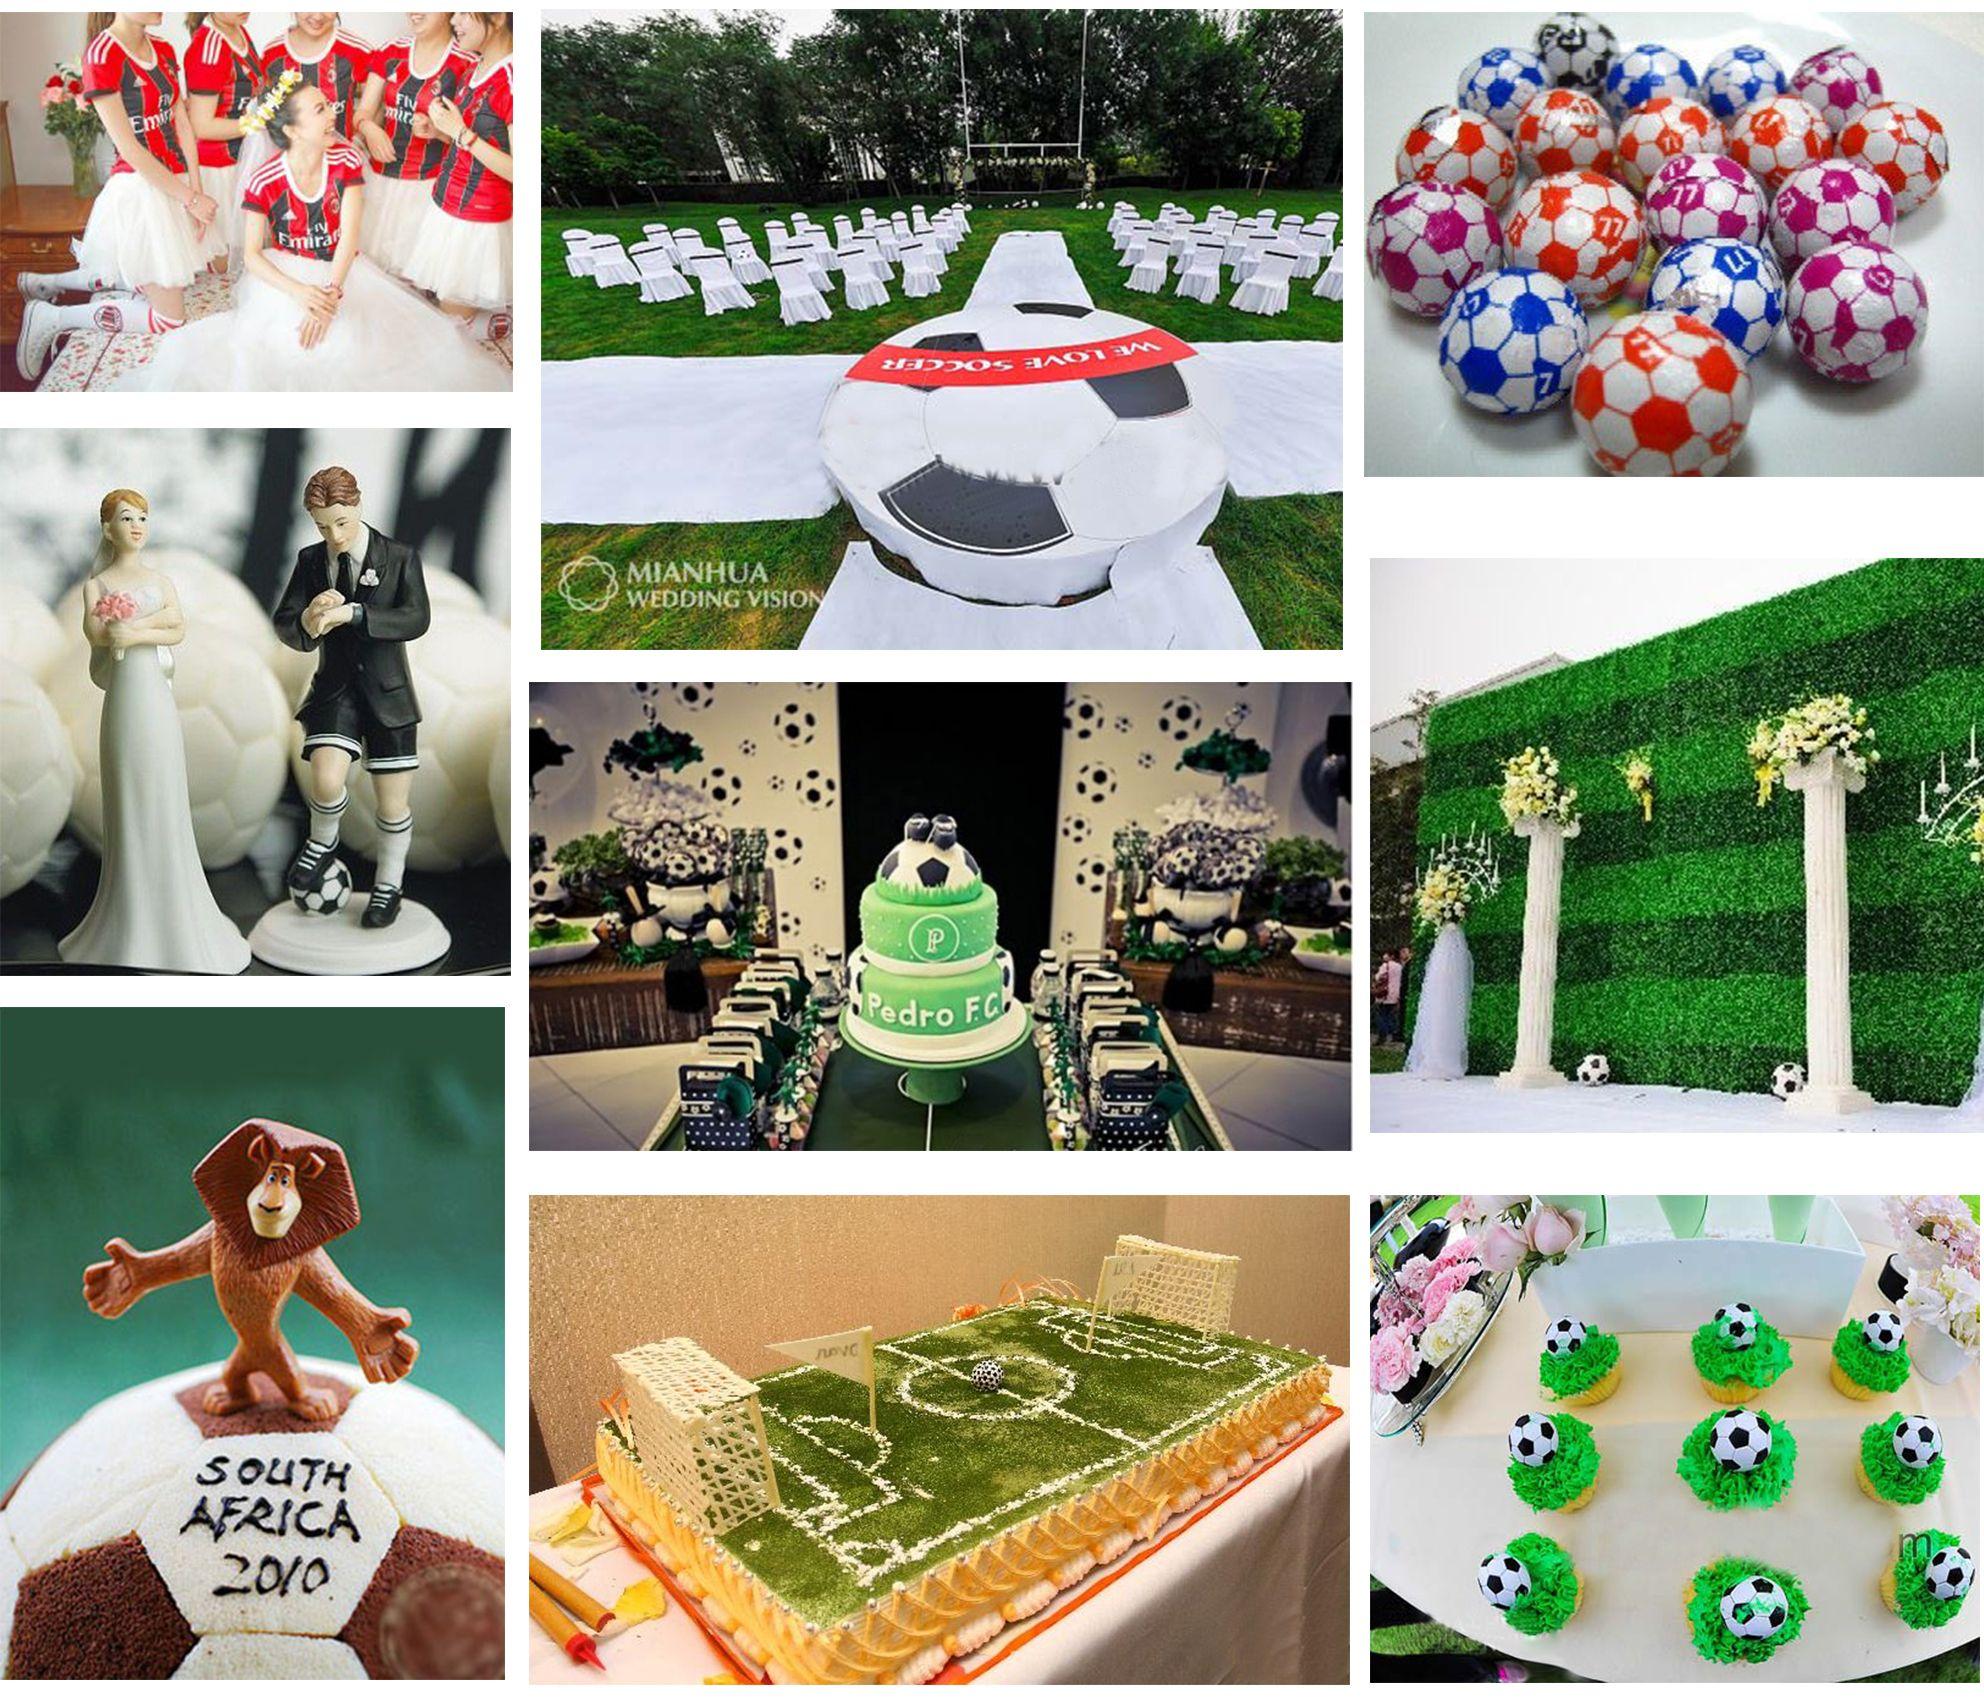 Football themed weddings best site hairstyle and wedding dress for football themed wedding party details themed wedding pinterest junglespirit Choice Image